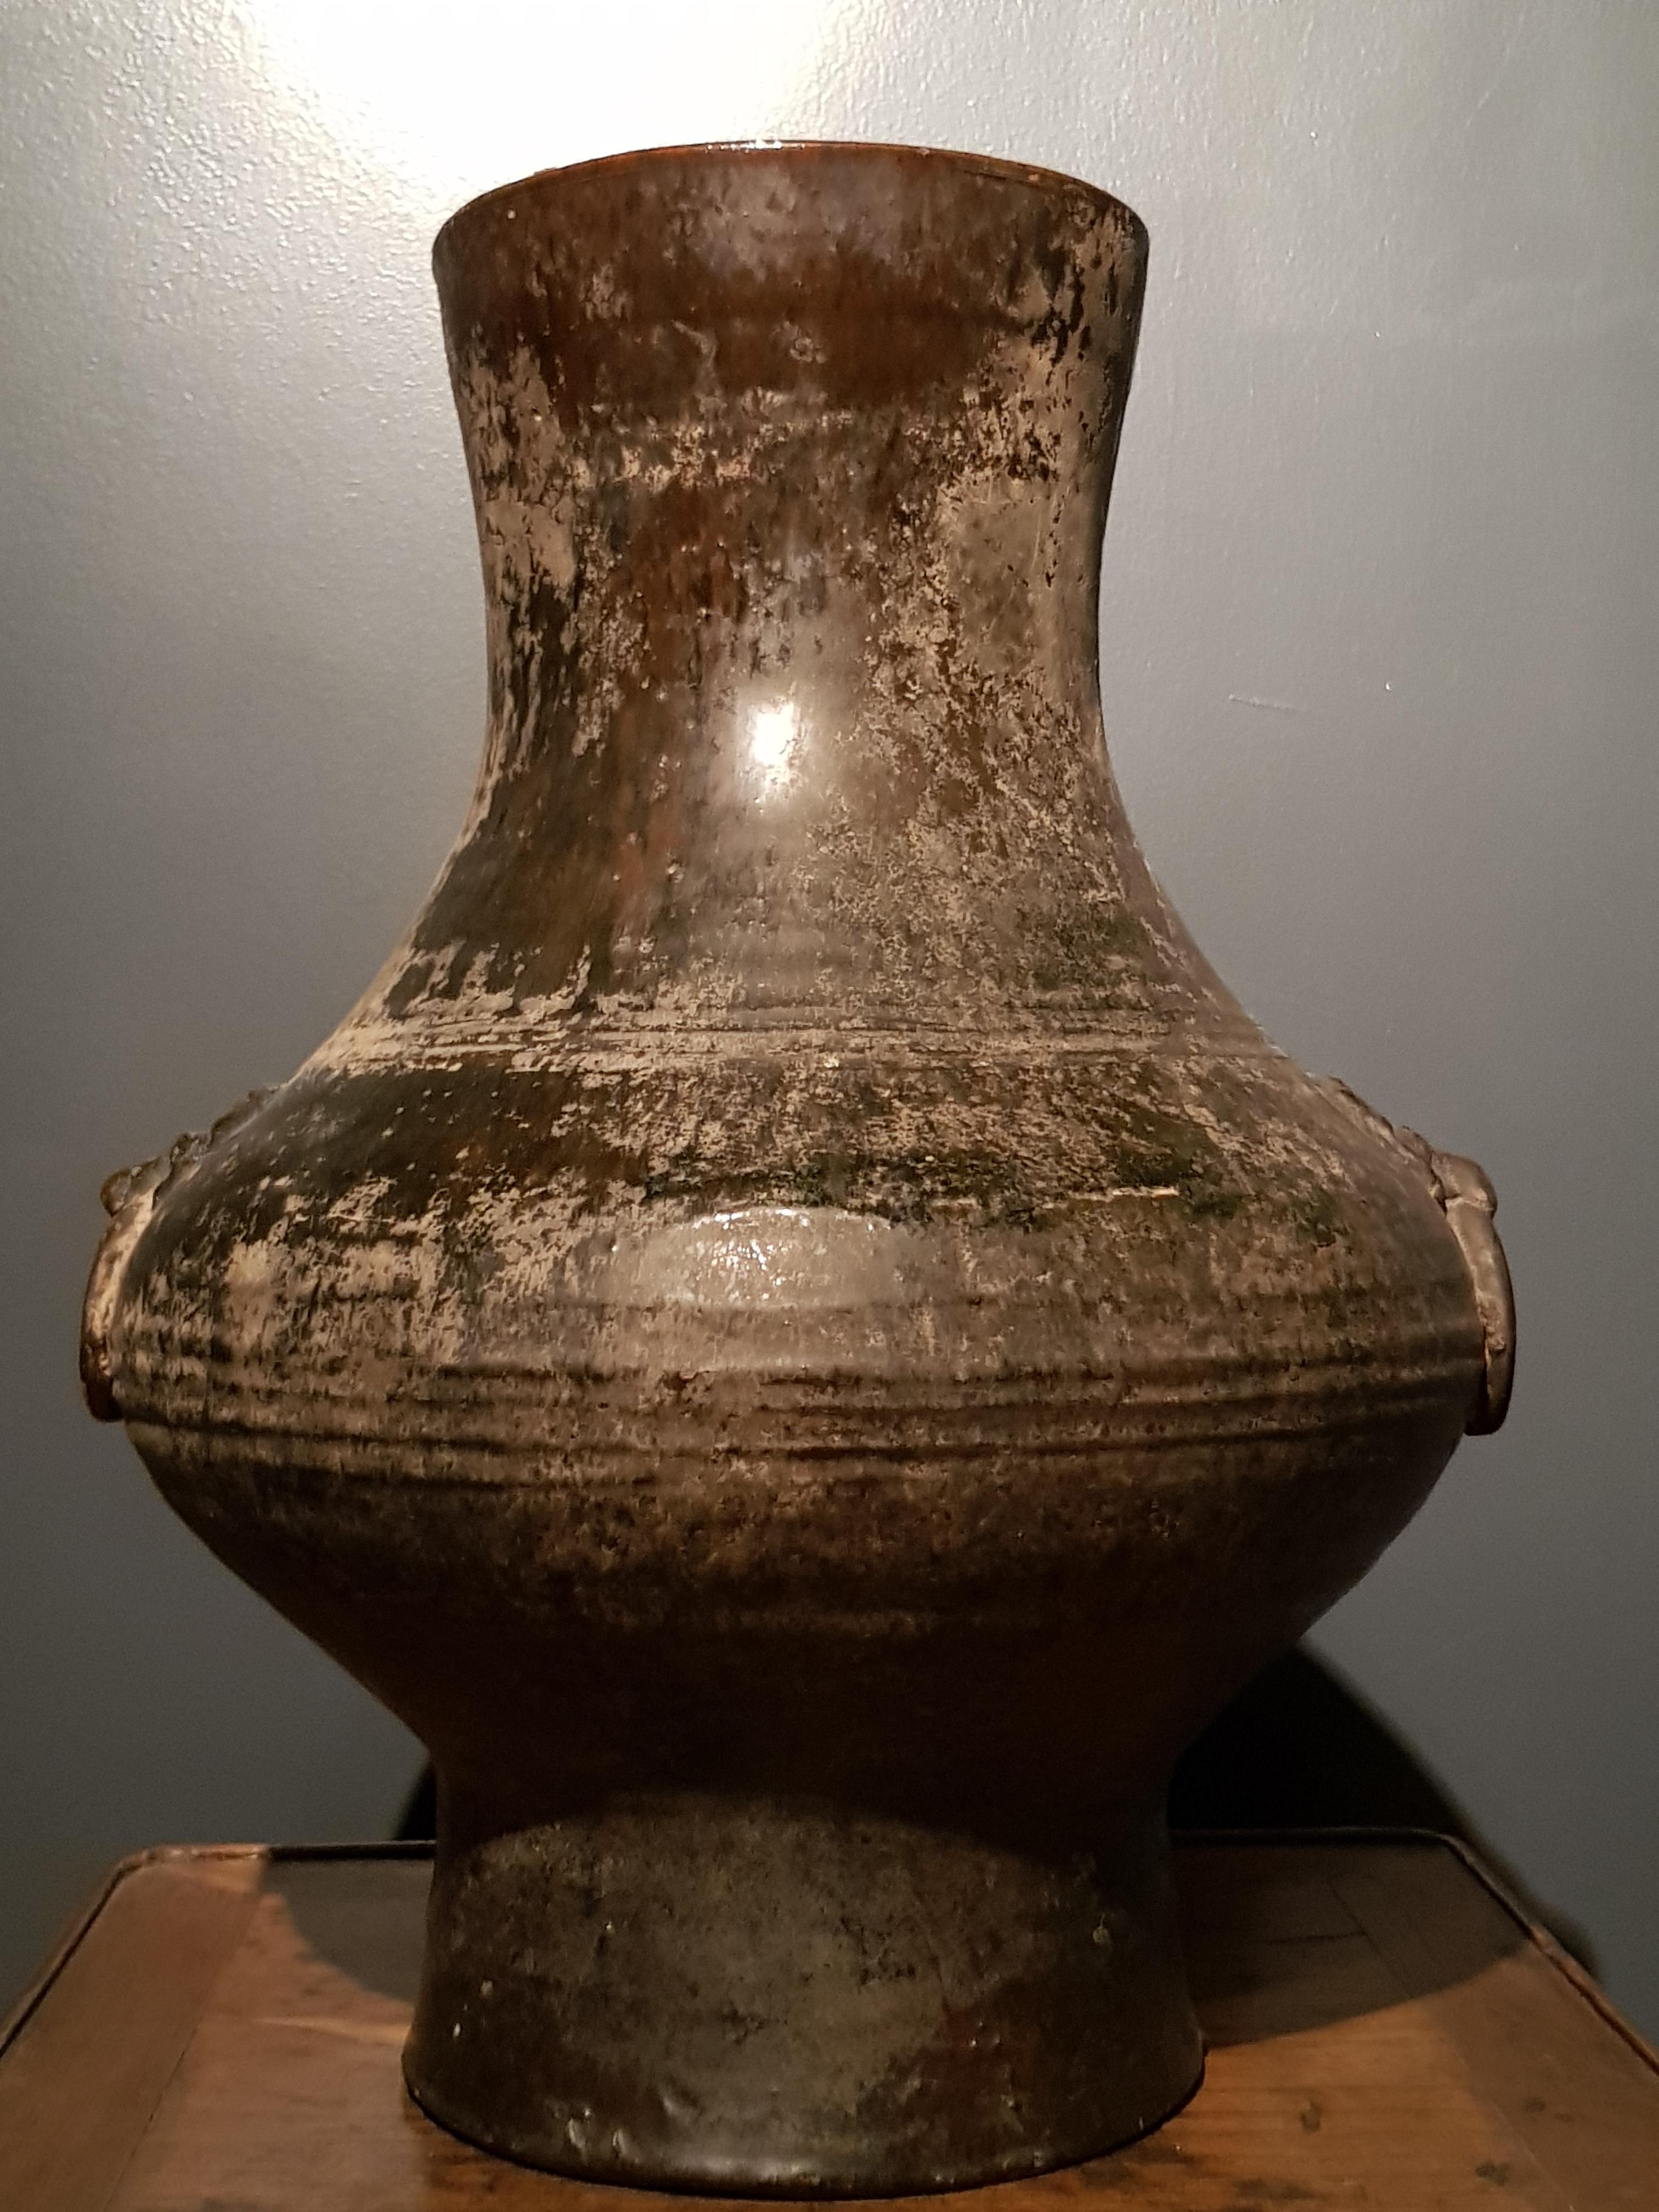 Vase de forme Hu - Dynastie Han(206BC - 220) - TL - VENDU Image